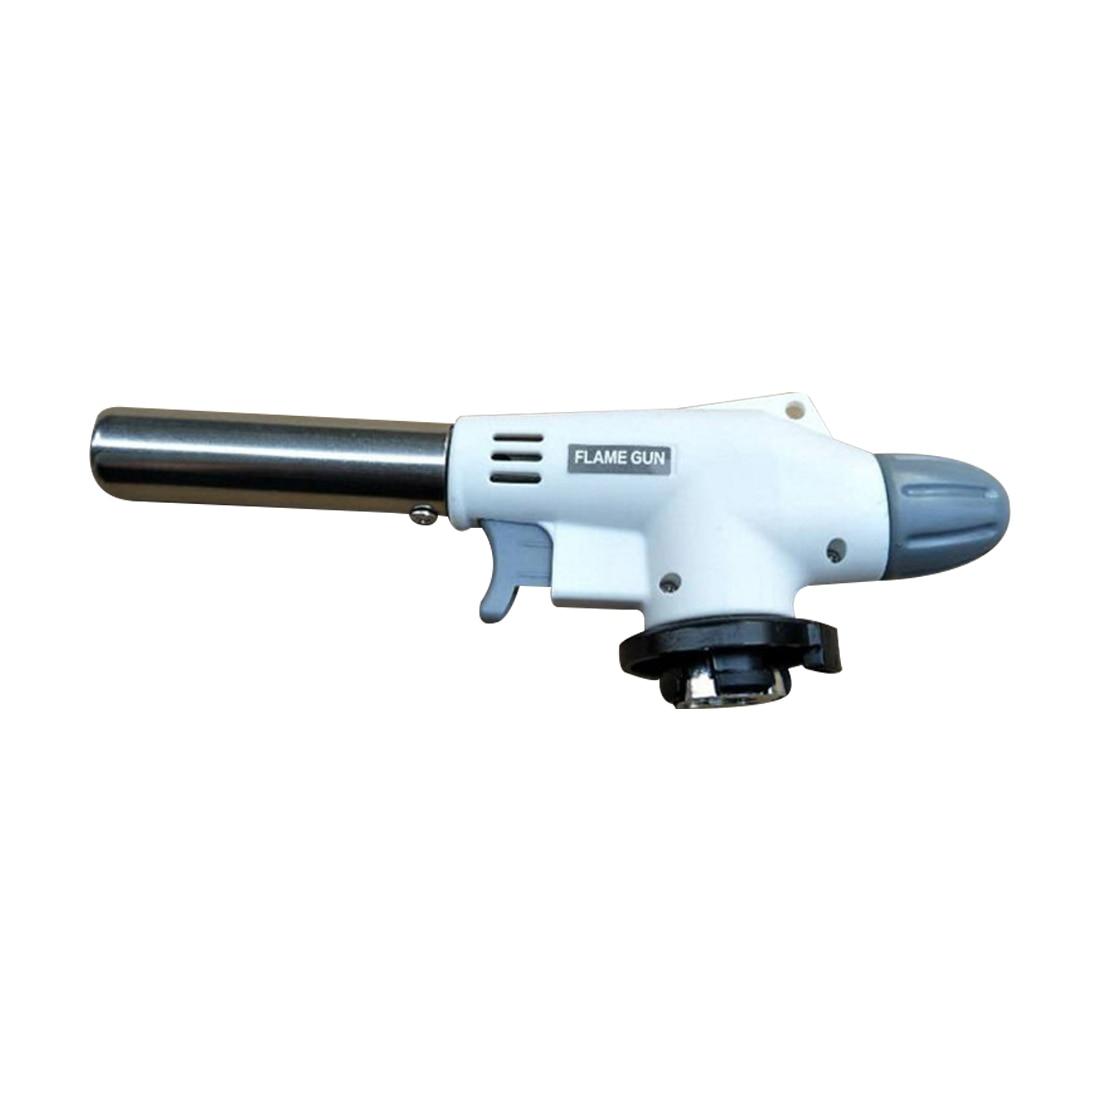 Multi-function Gas Torch Flame Gun Blowtorch Cooking Soldering Butane AutoIgnition Gas-Burner Lighter Heating Welding Gas Burner